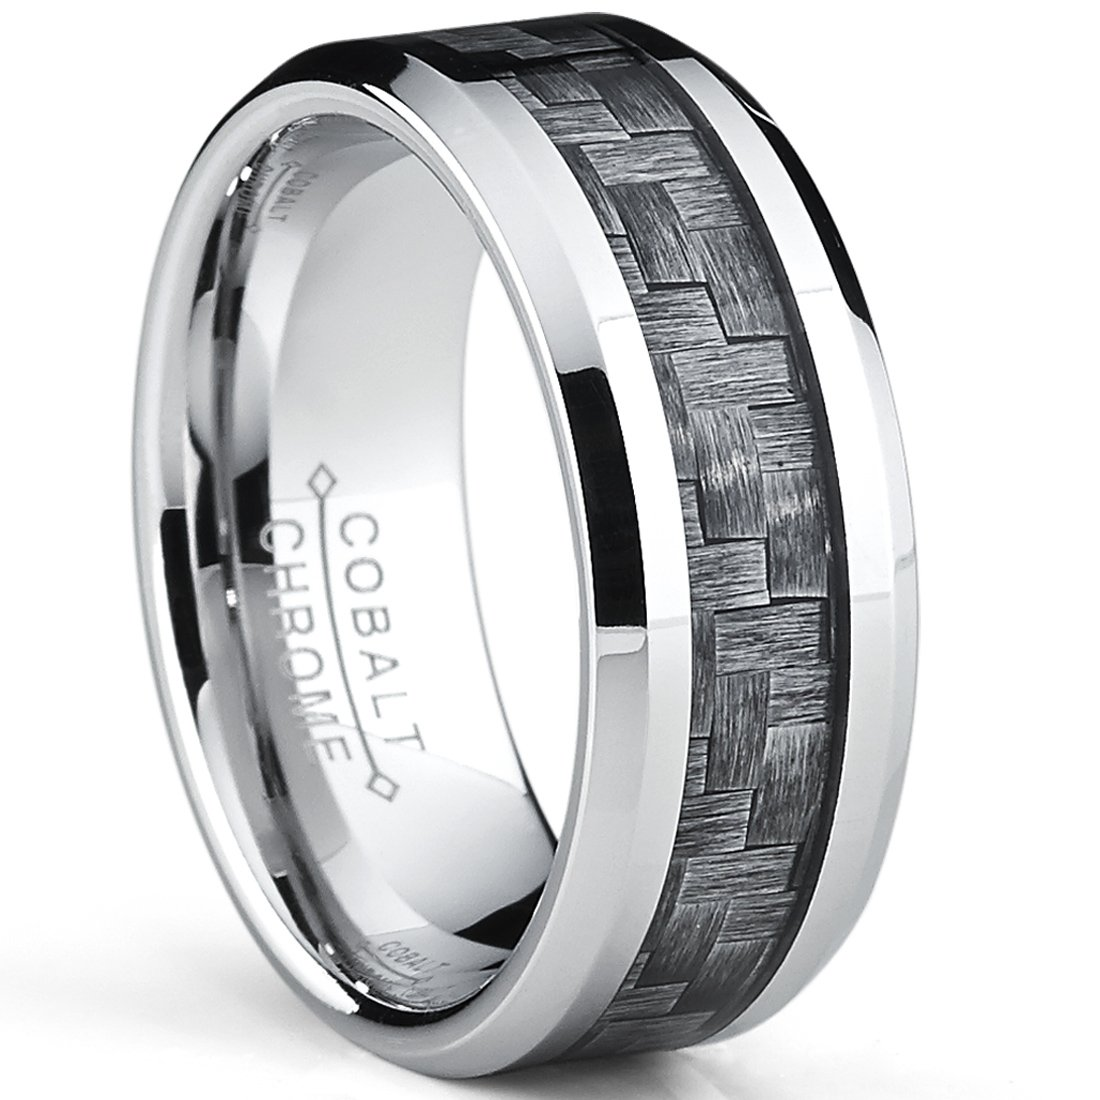 Metal Masters Co. High Polish Cobalt Men's Wedding Band Engagement Ring W/Gray Carbon Fiber Inlay, Comfort Fit SZ 13